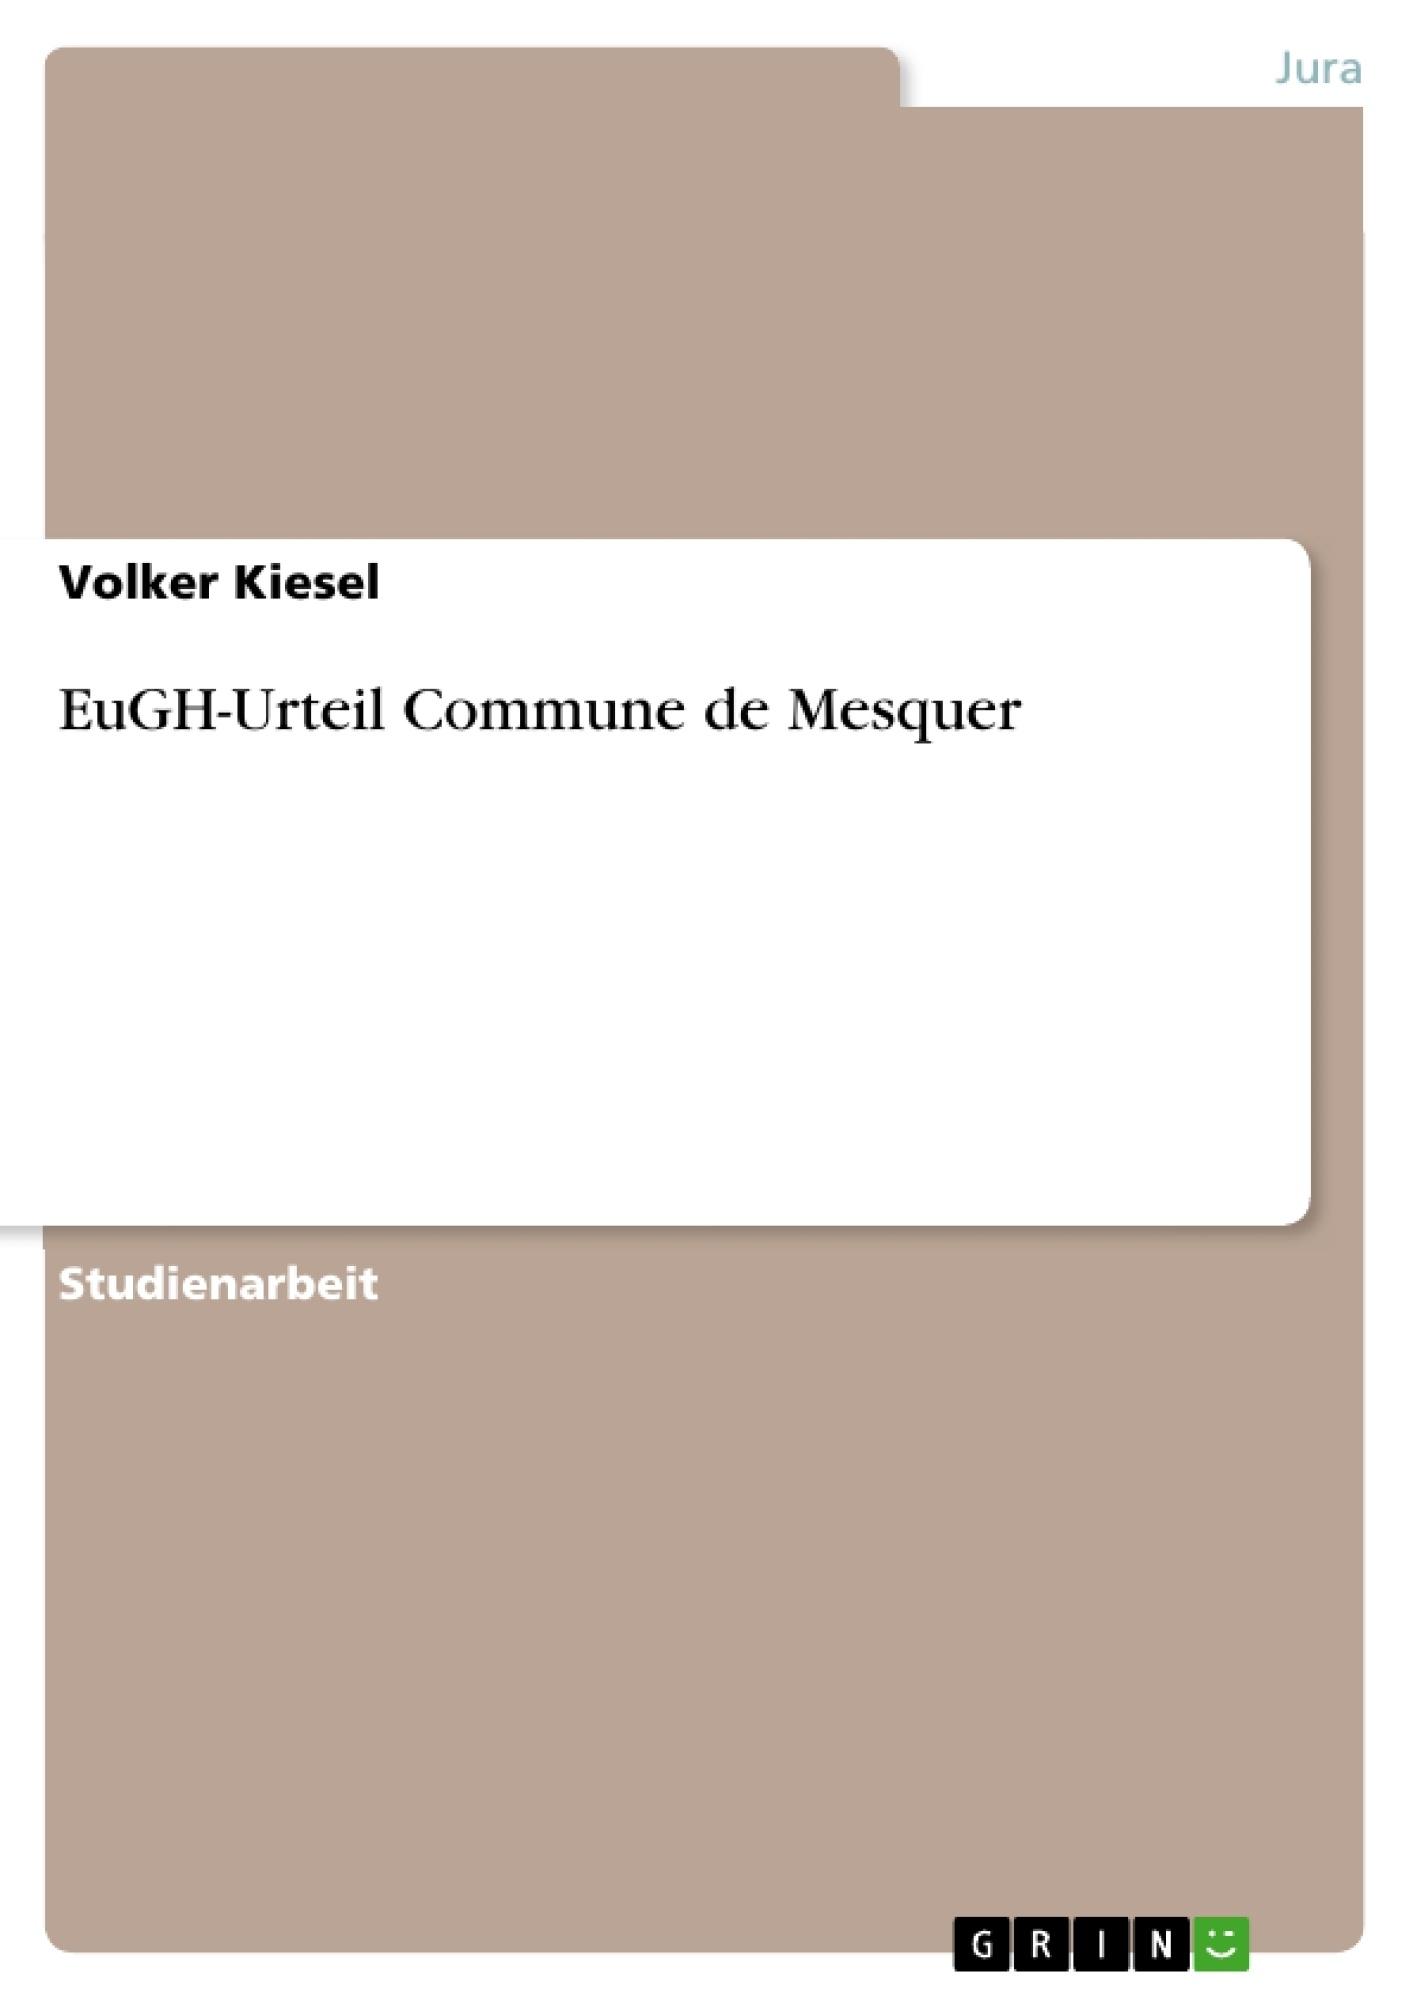 Titel: EuGH-Urteil Commune de Mesquer